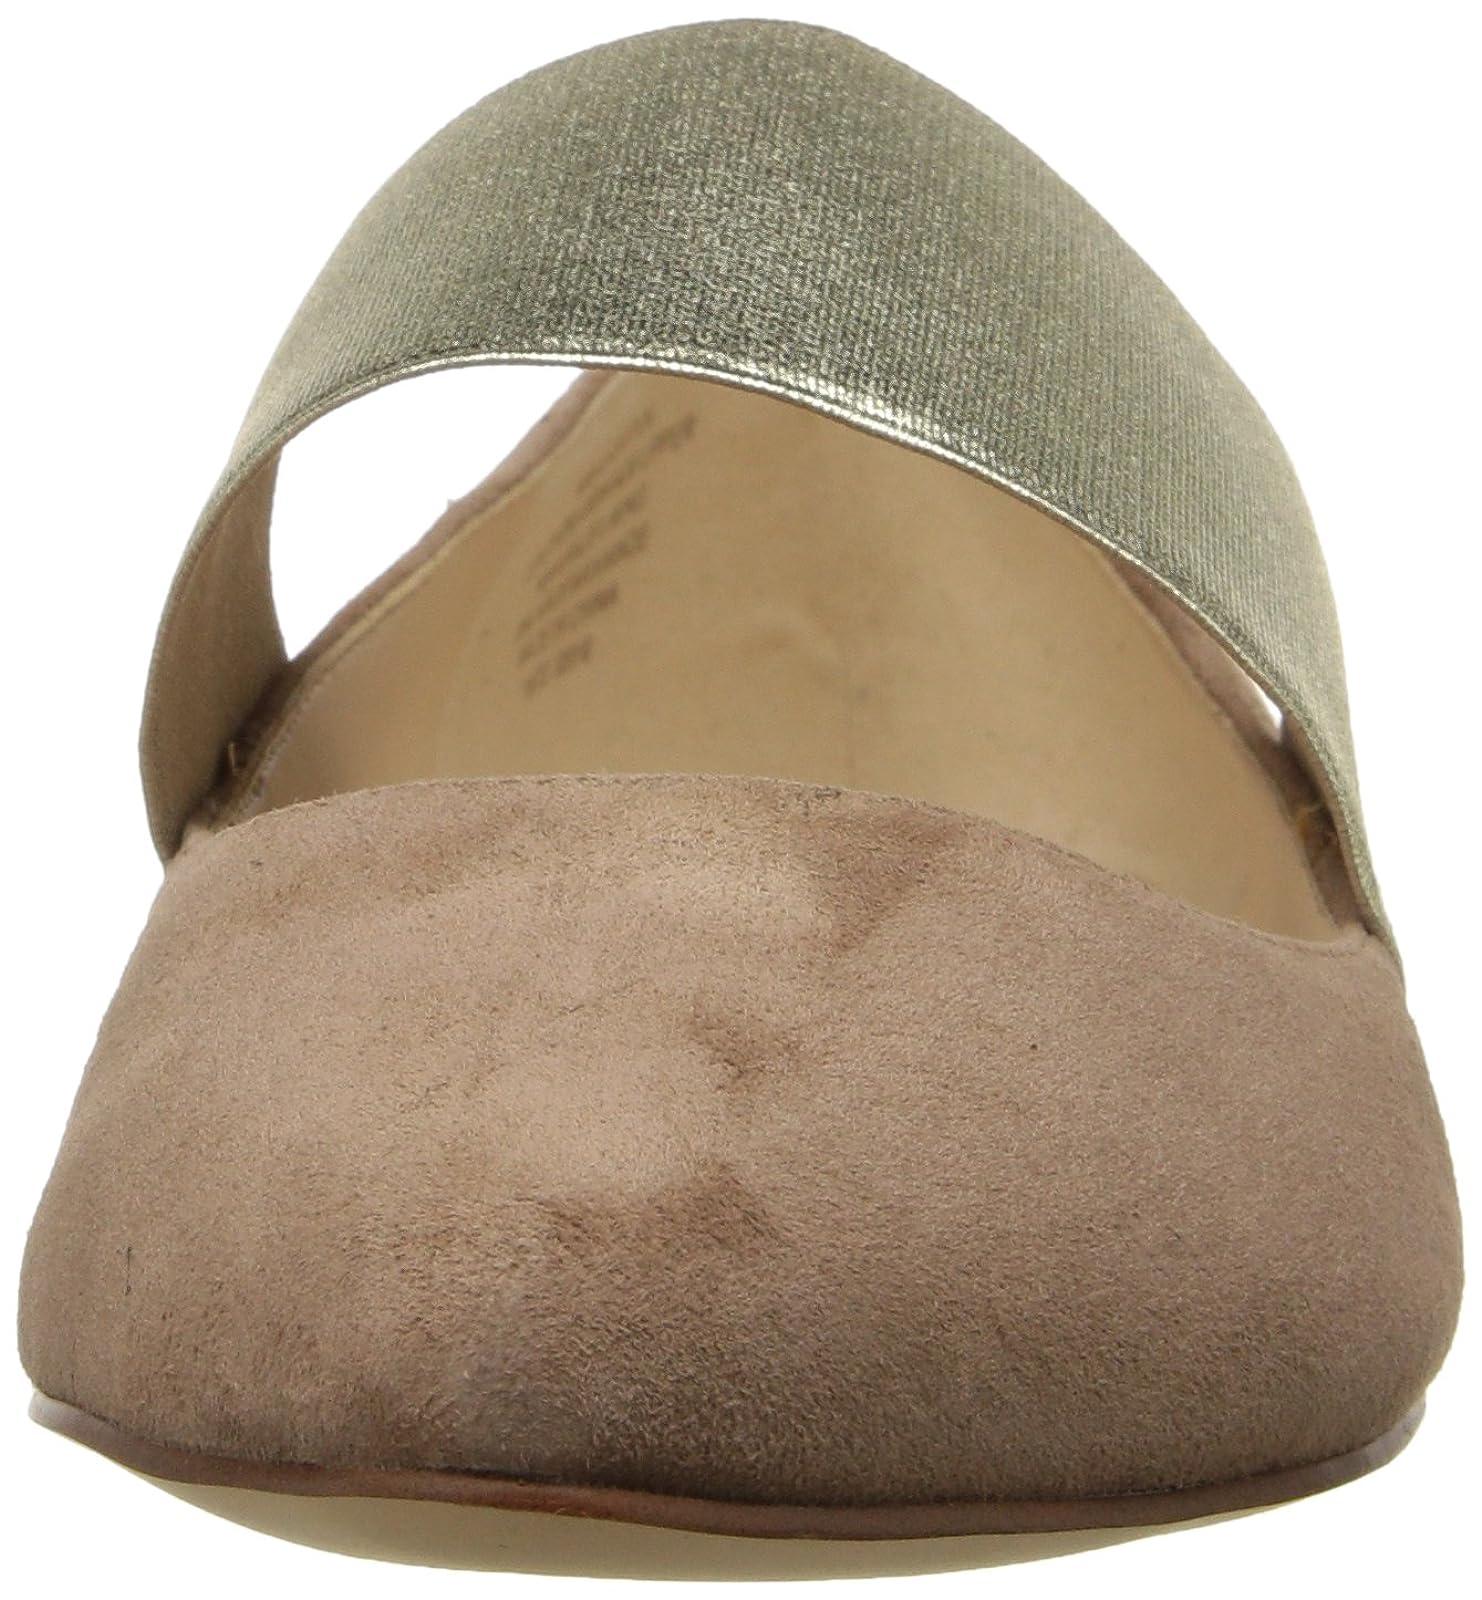 Nine West Women's Seabrook Suede Ballet Flat 5 M US - 4